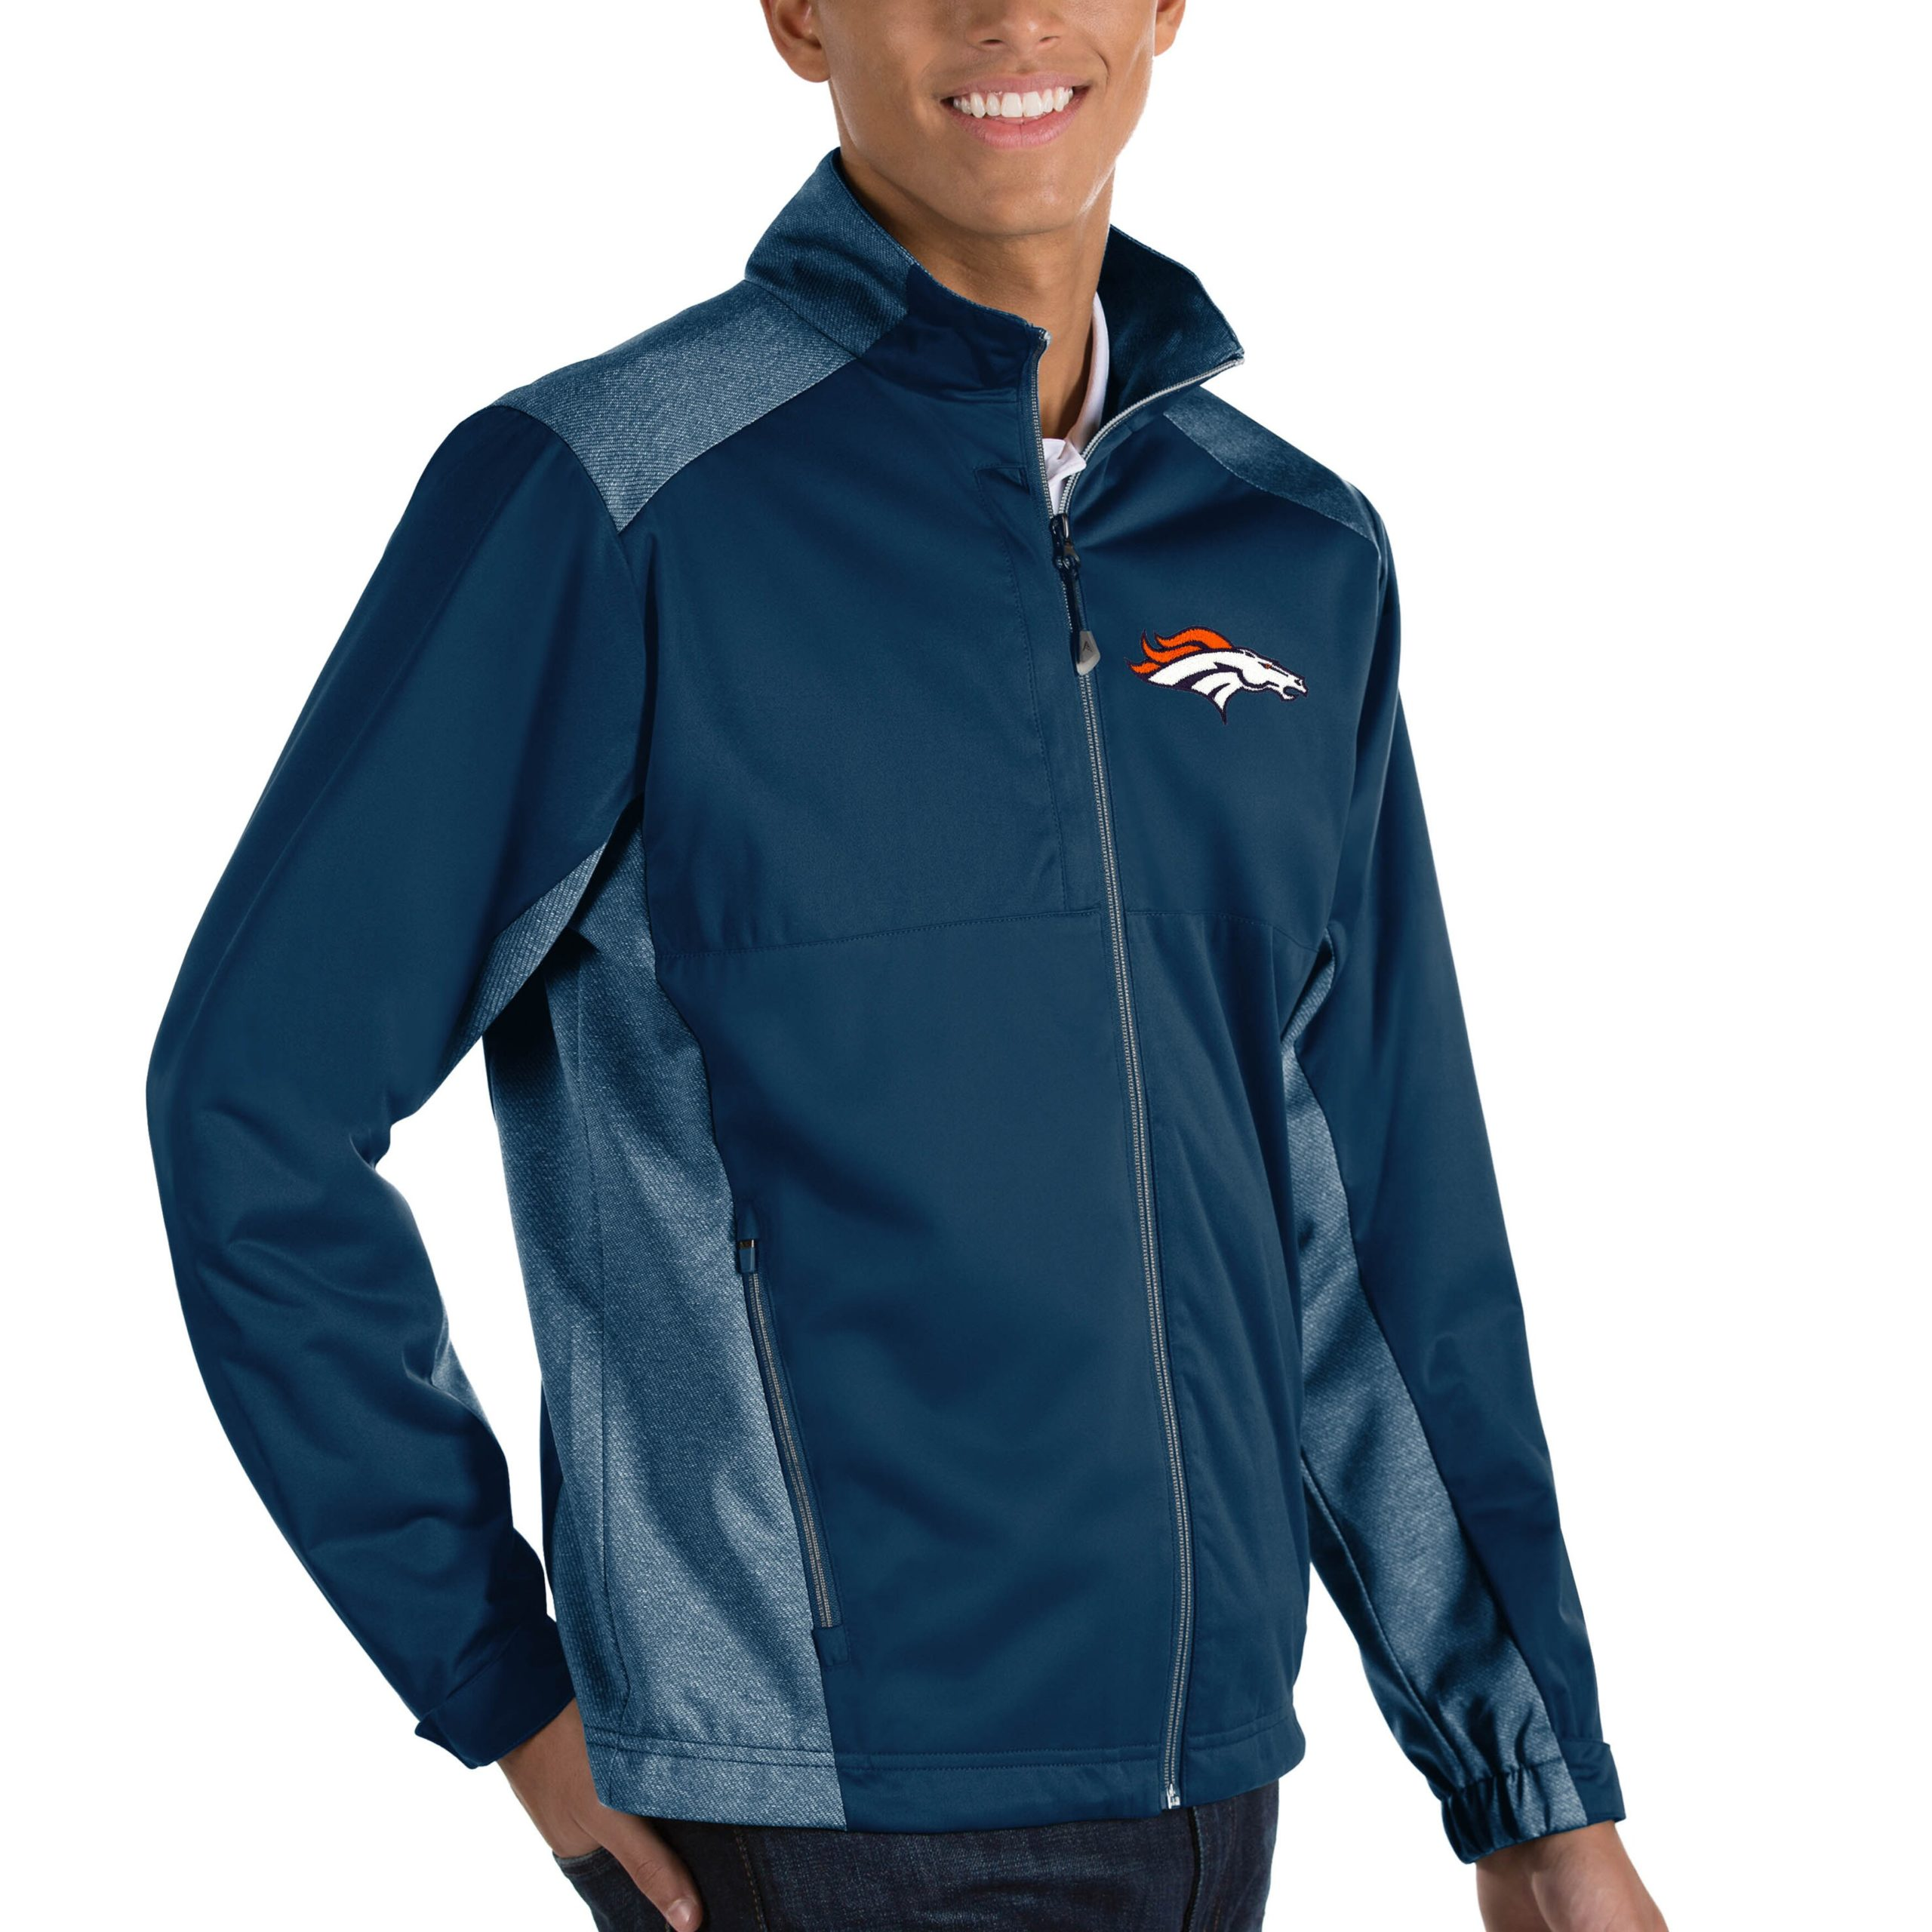 Denver Broncos Antigua Revolve Big & Tall Full-Zip Jacket - Heather Navy